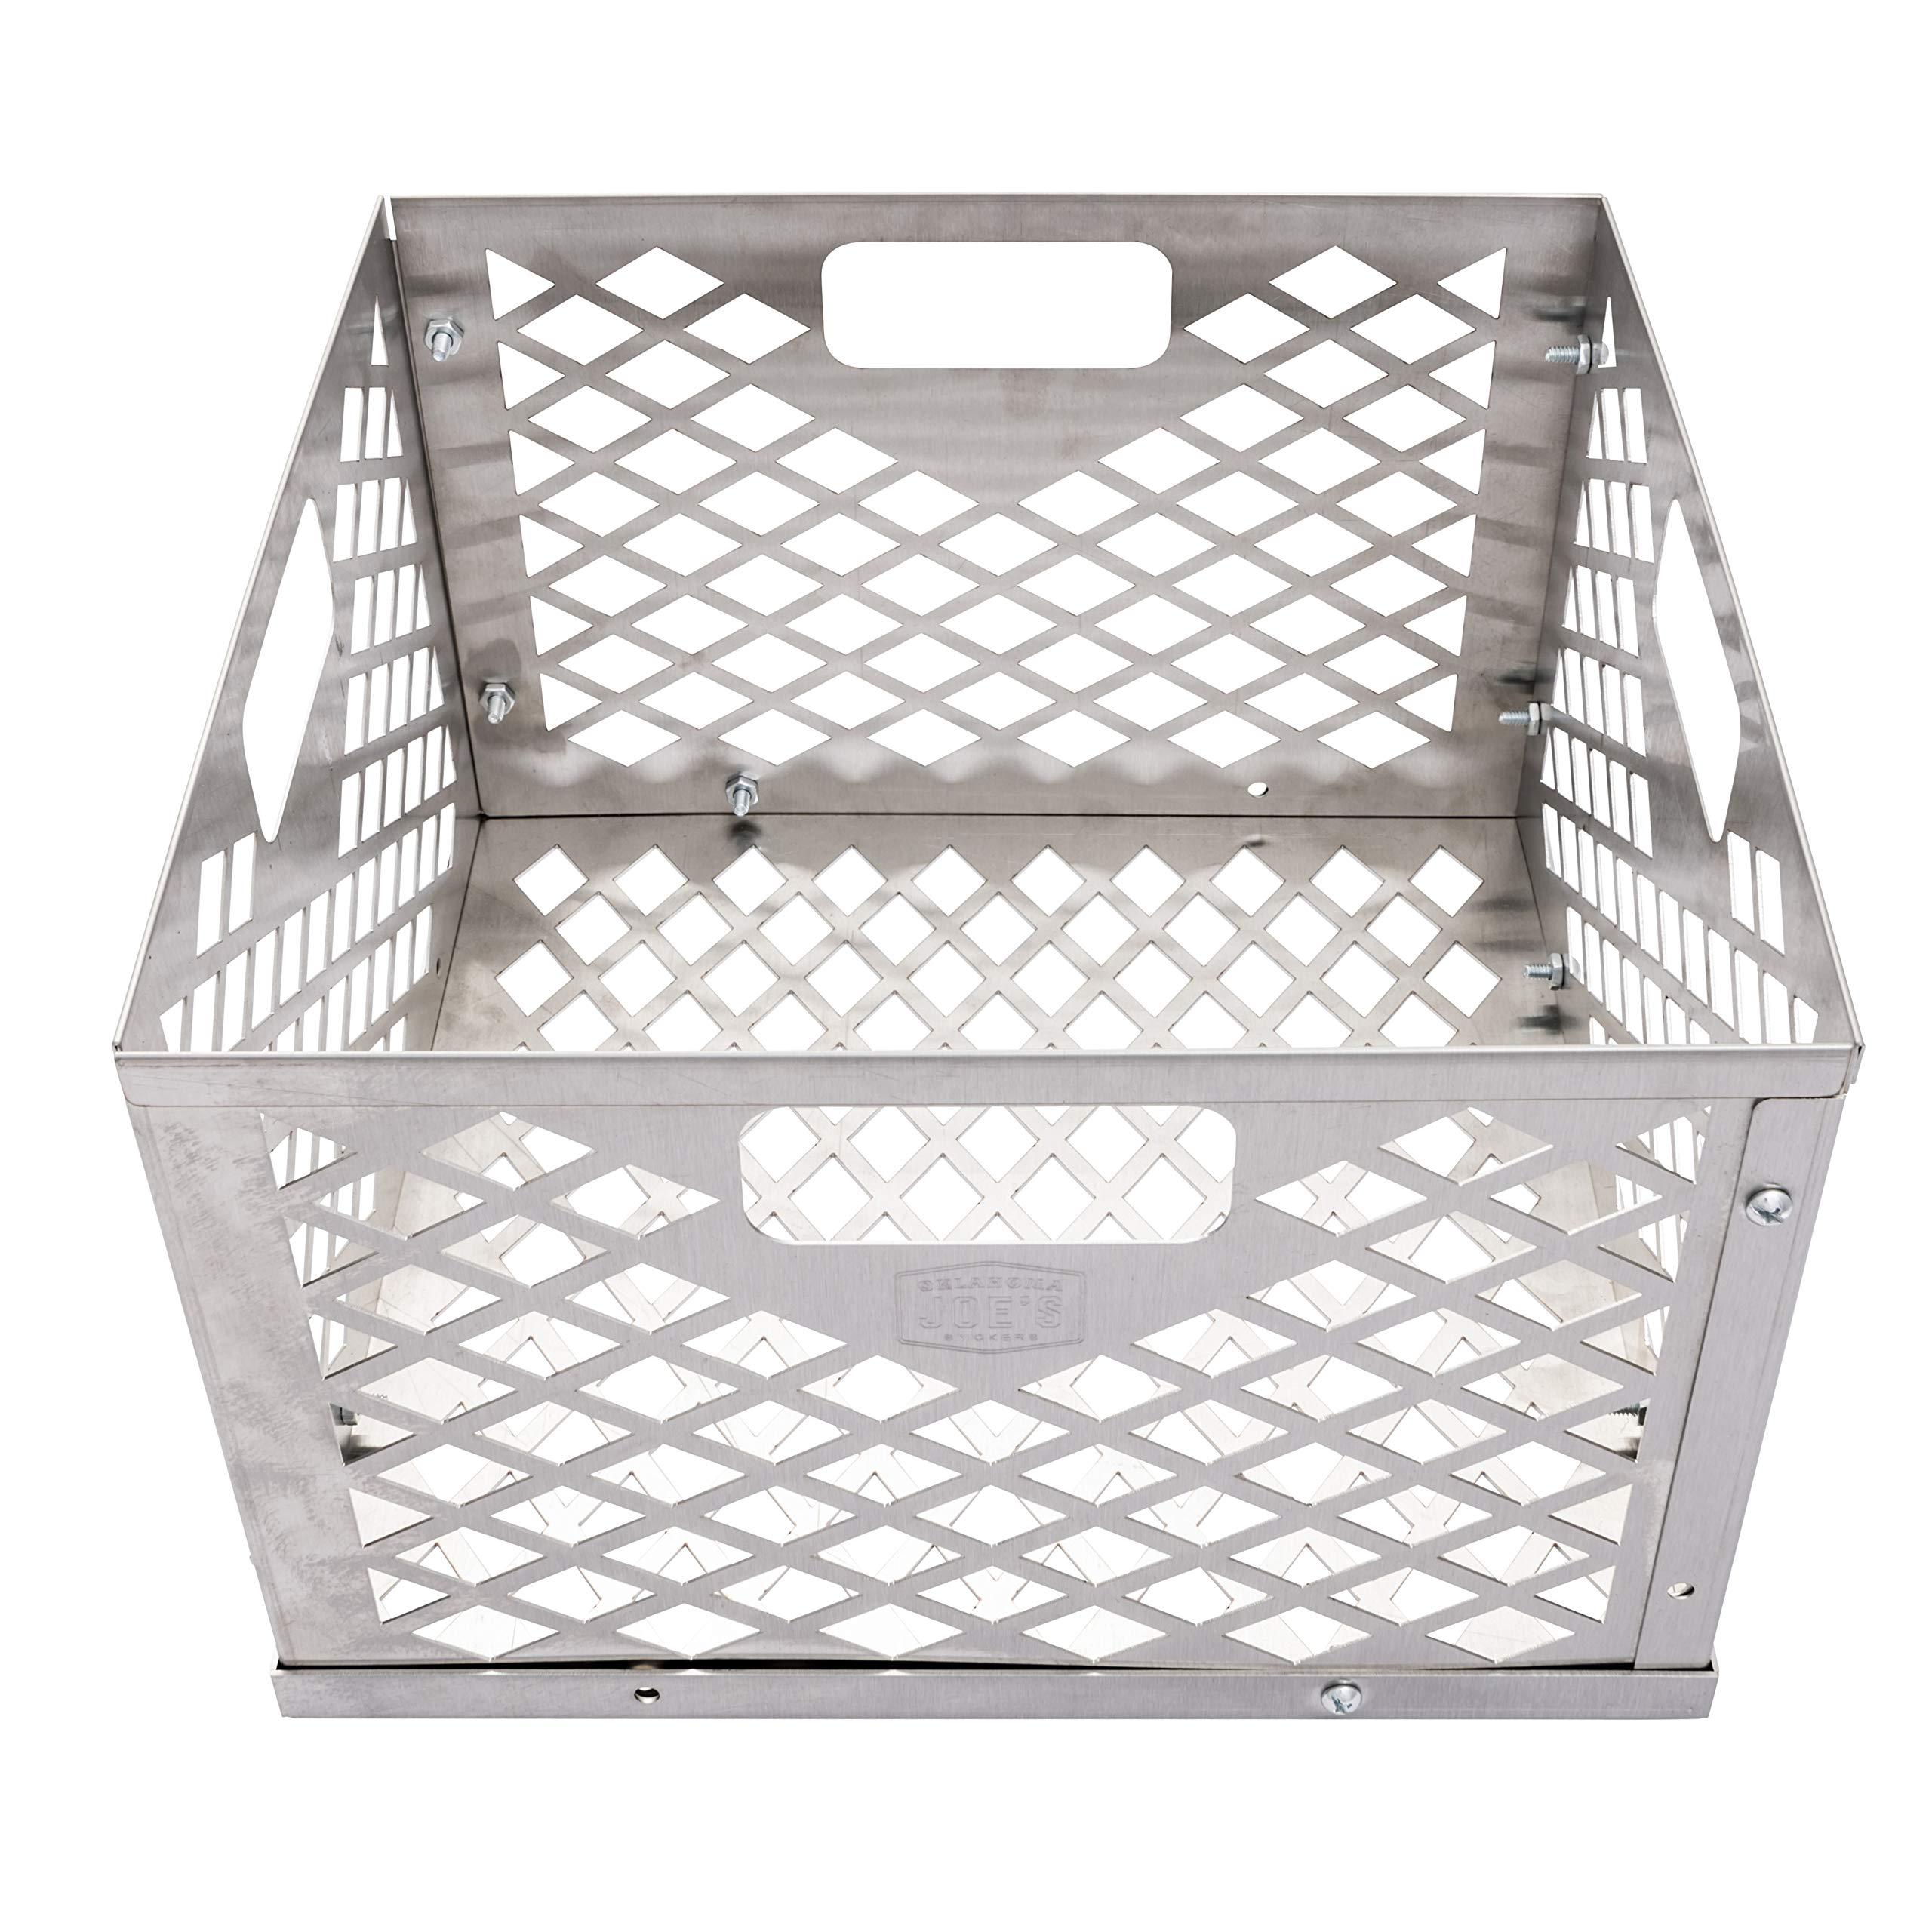 Oklahoma Joe's 5279338P04 Firebox Basket, Silver by Oklahoma Joe's (Image #2)